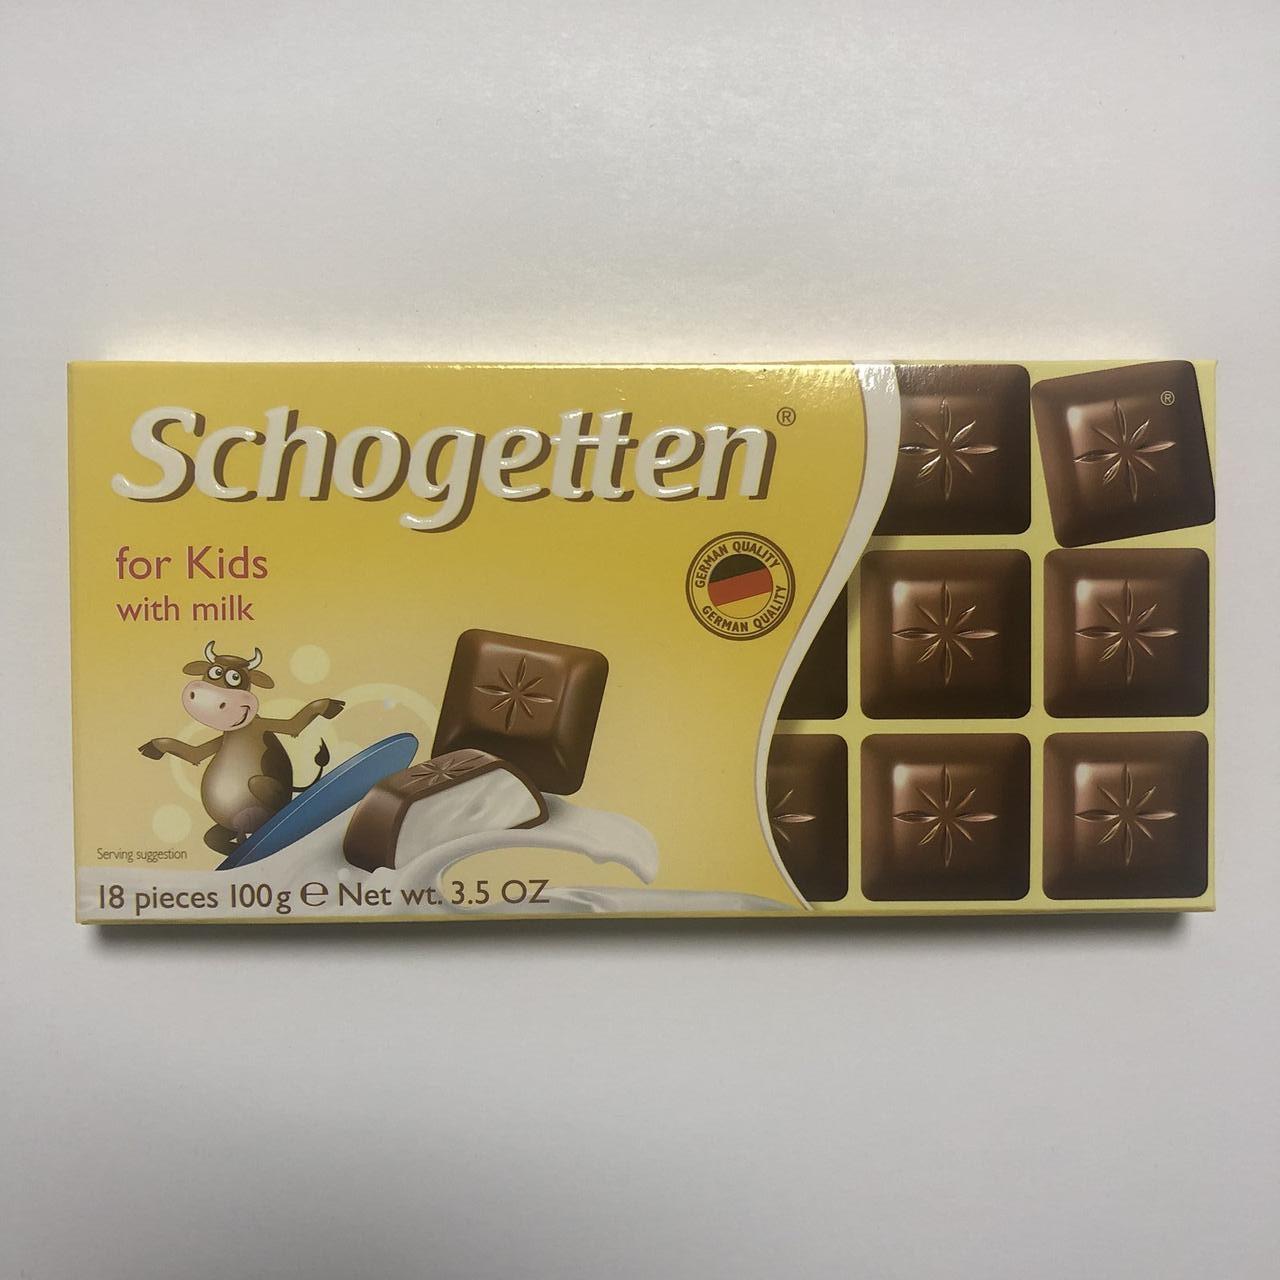 Шоколад молочный «Schogetten» for Kids (для детей), 100 г.